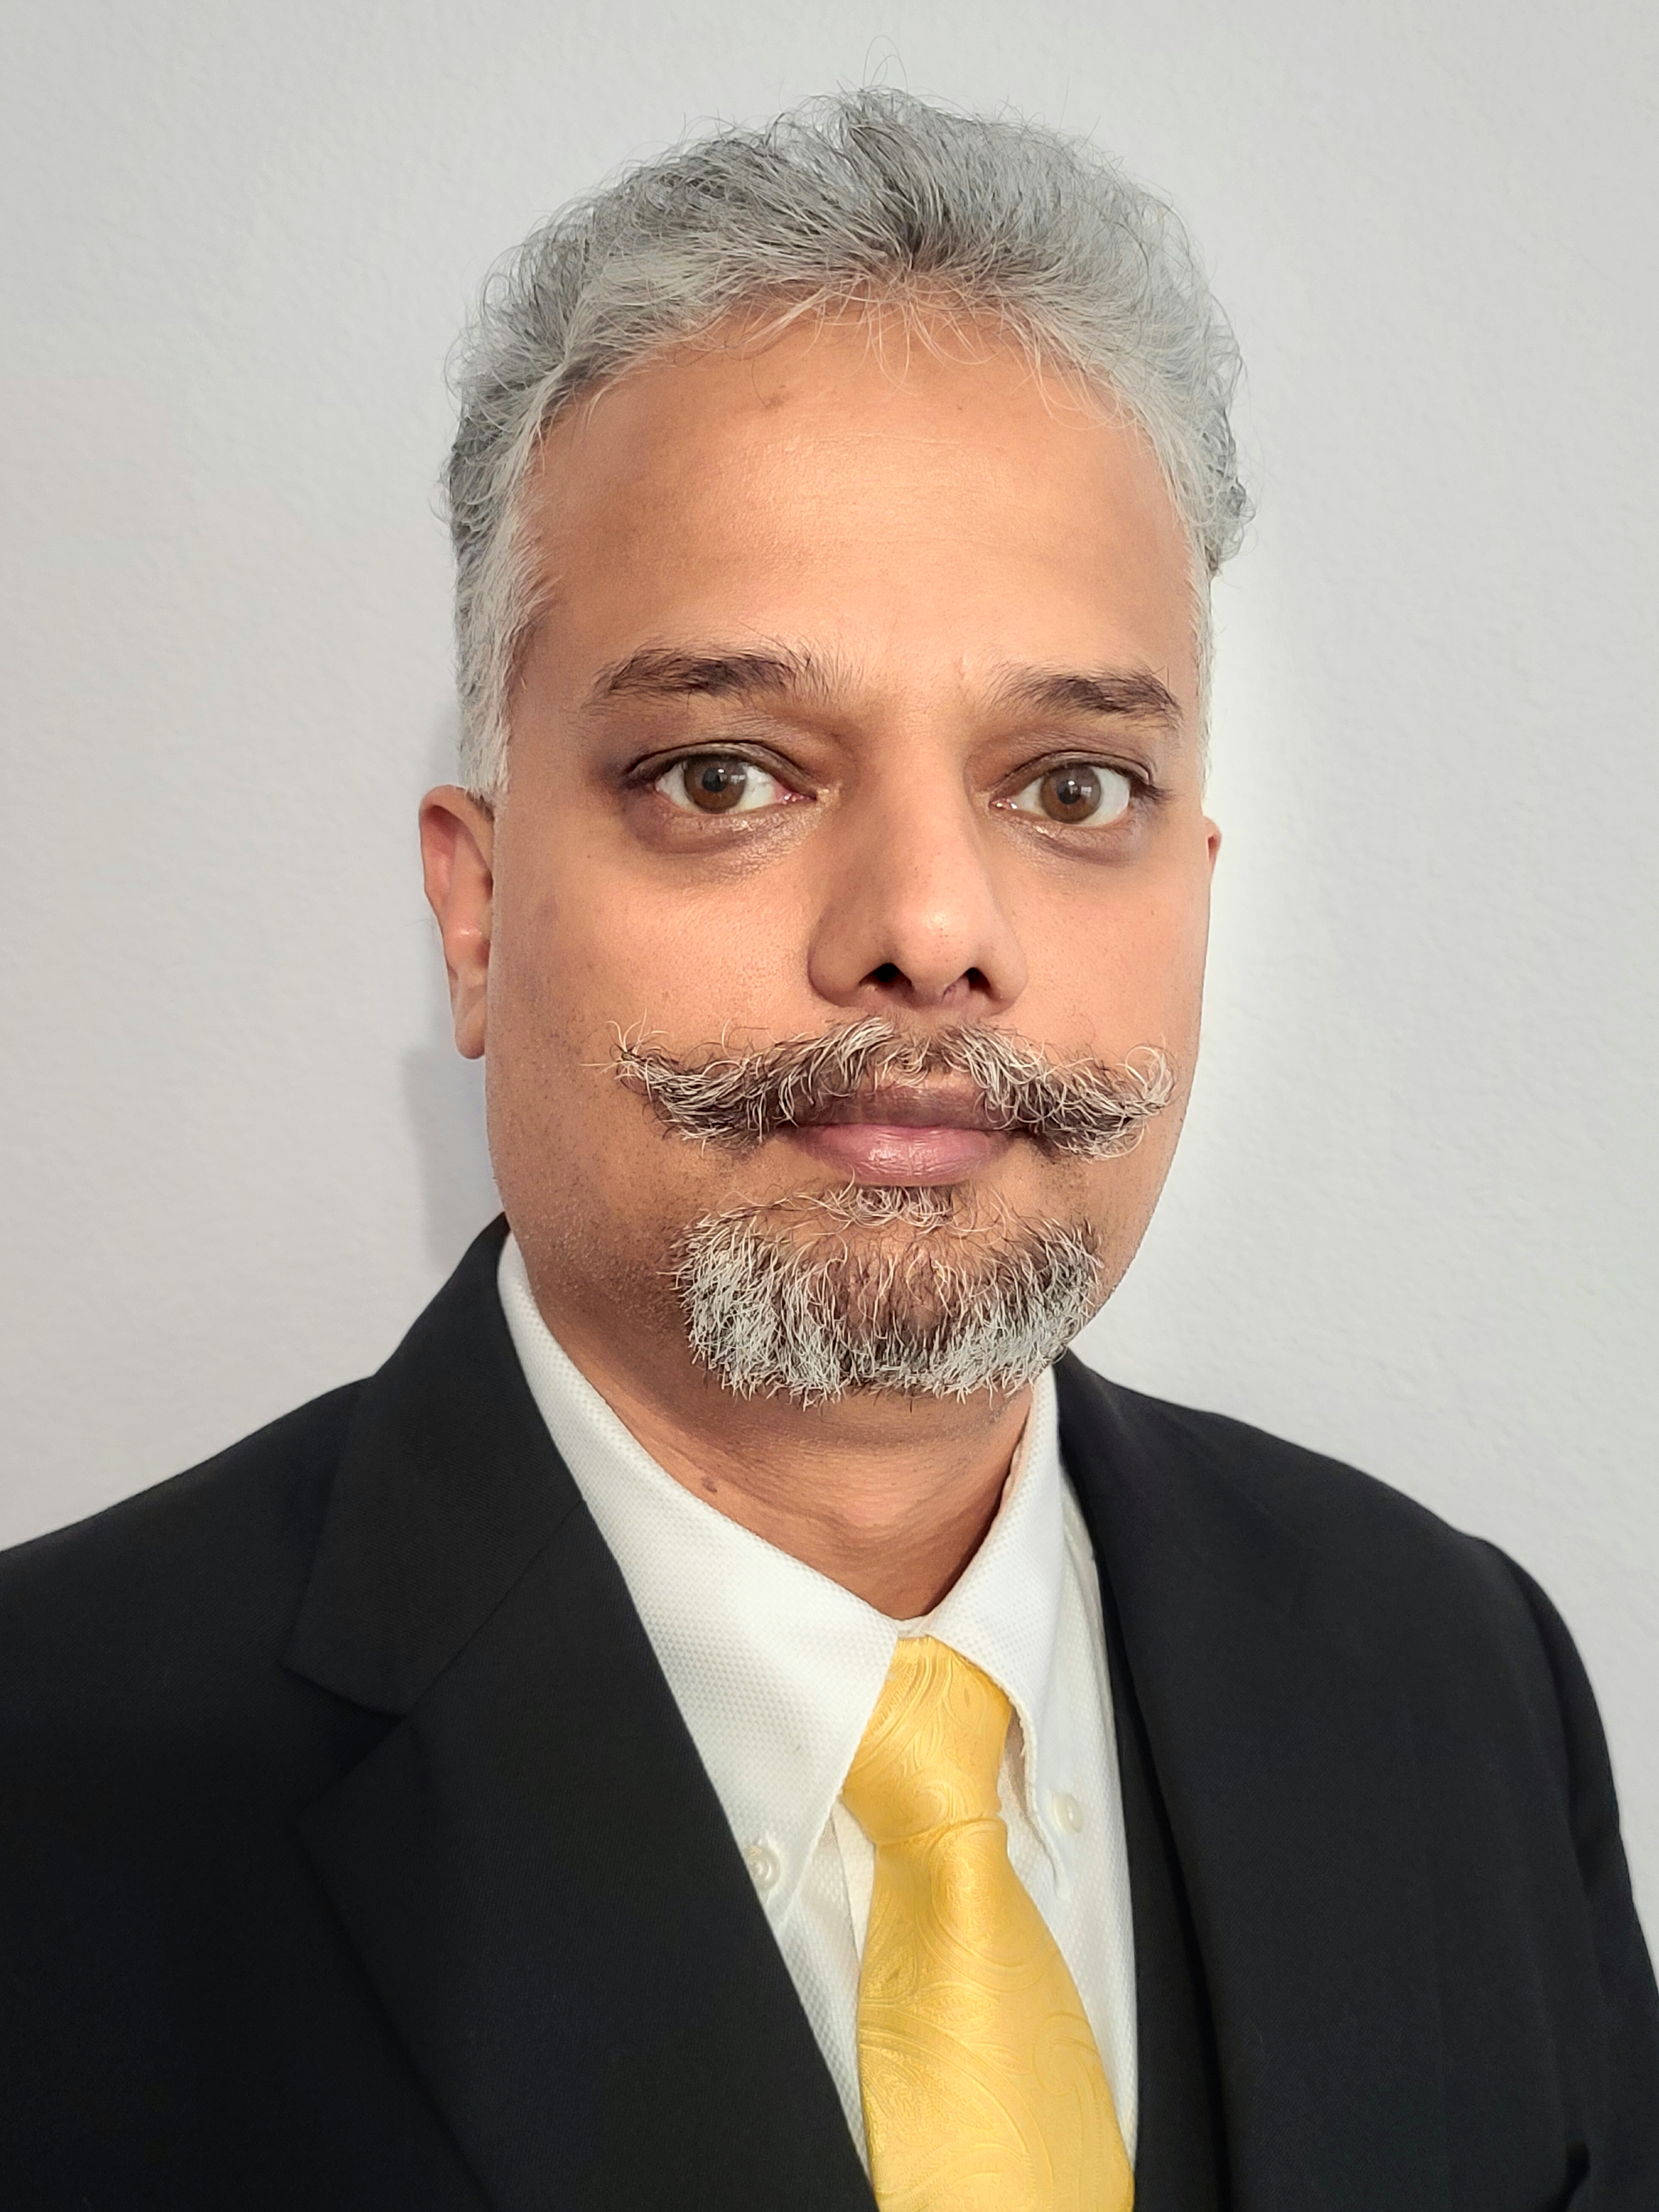 Ashu Suvarna